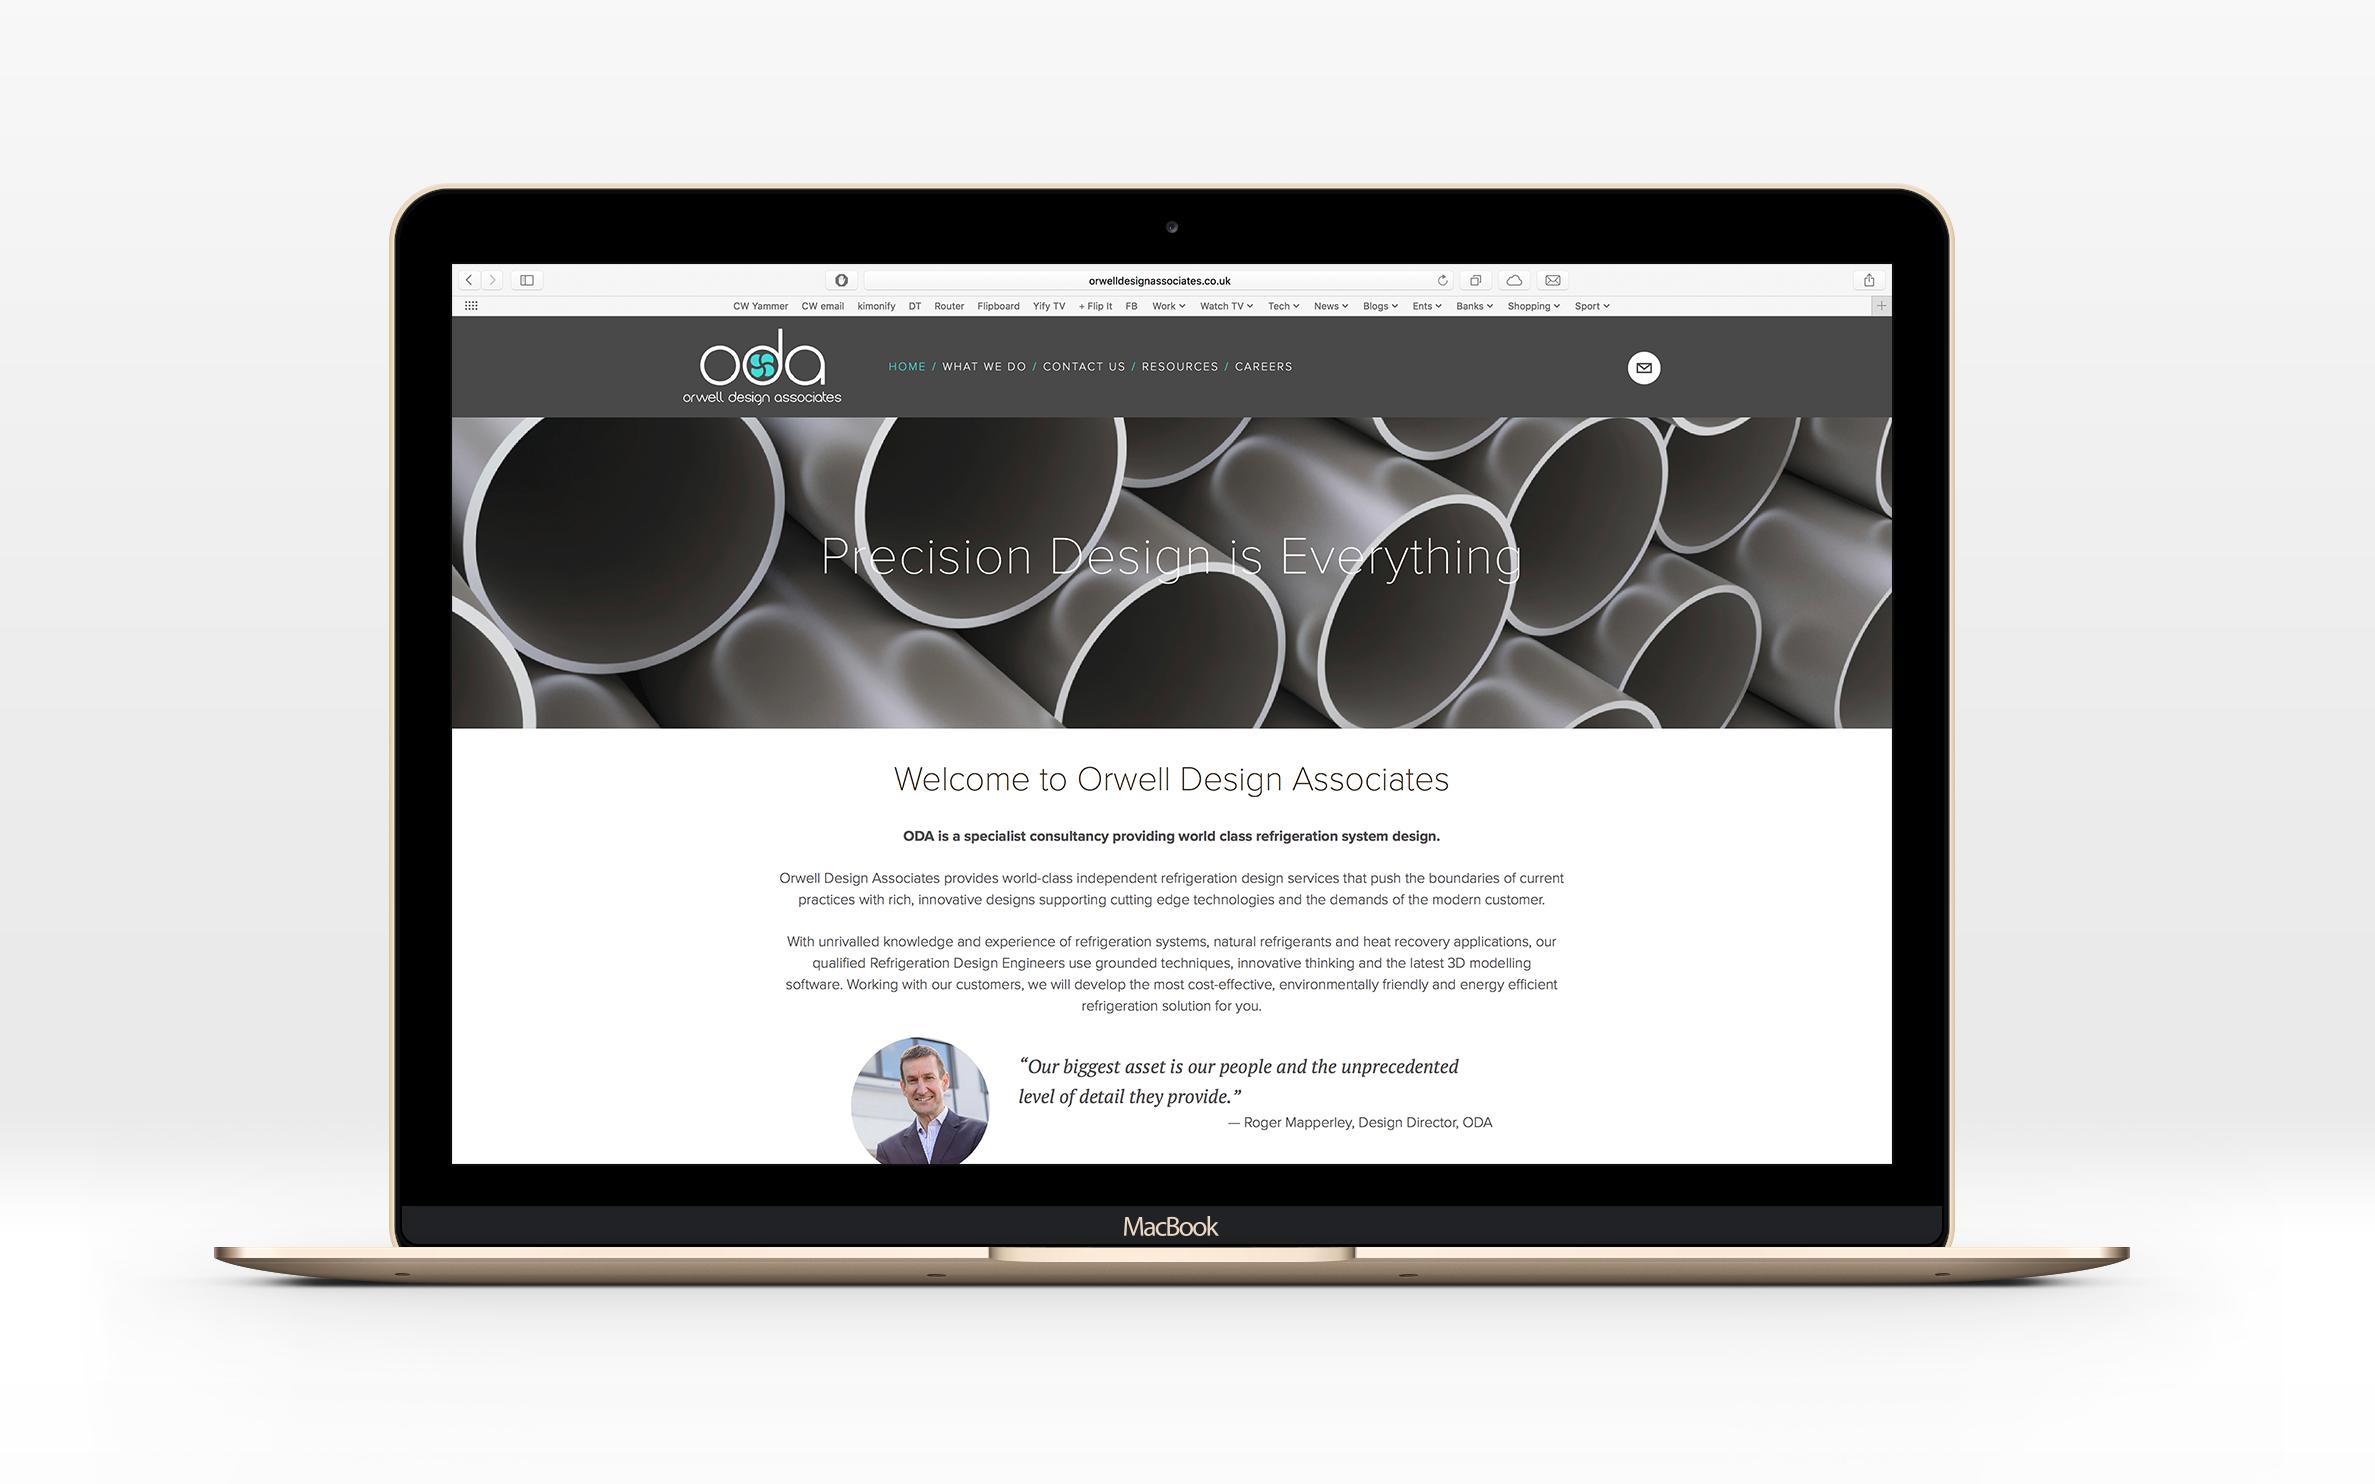 Vivid content marketing orwell design associates